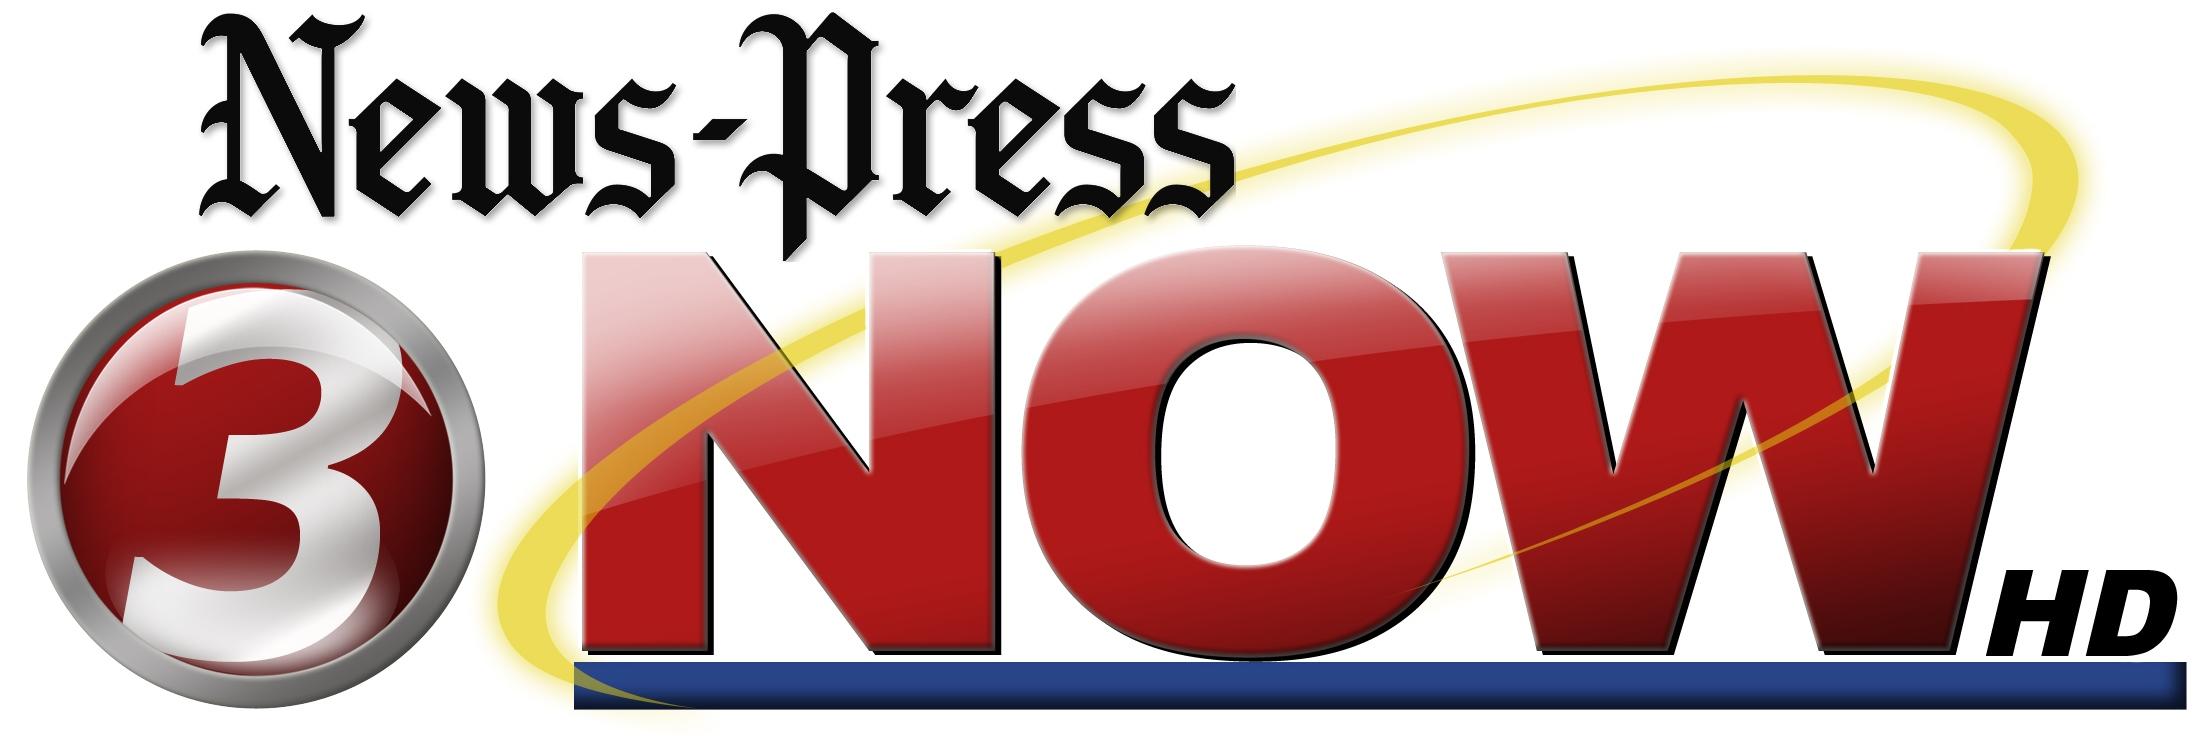 News-Press 3 NOW